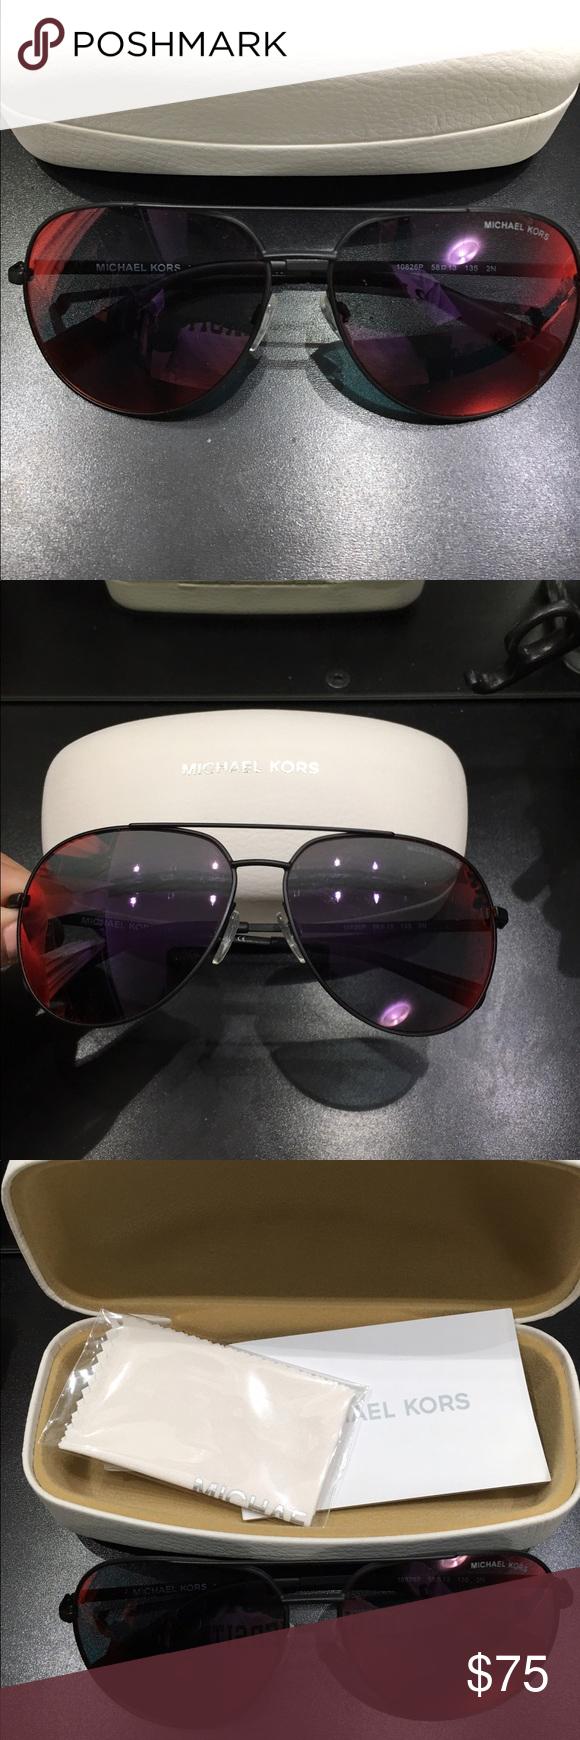 8d49709271f16 Michael Kors Sunglasses aviators Brand new Michael Kors sunglasses! The  exact style is